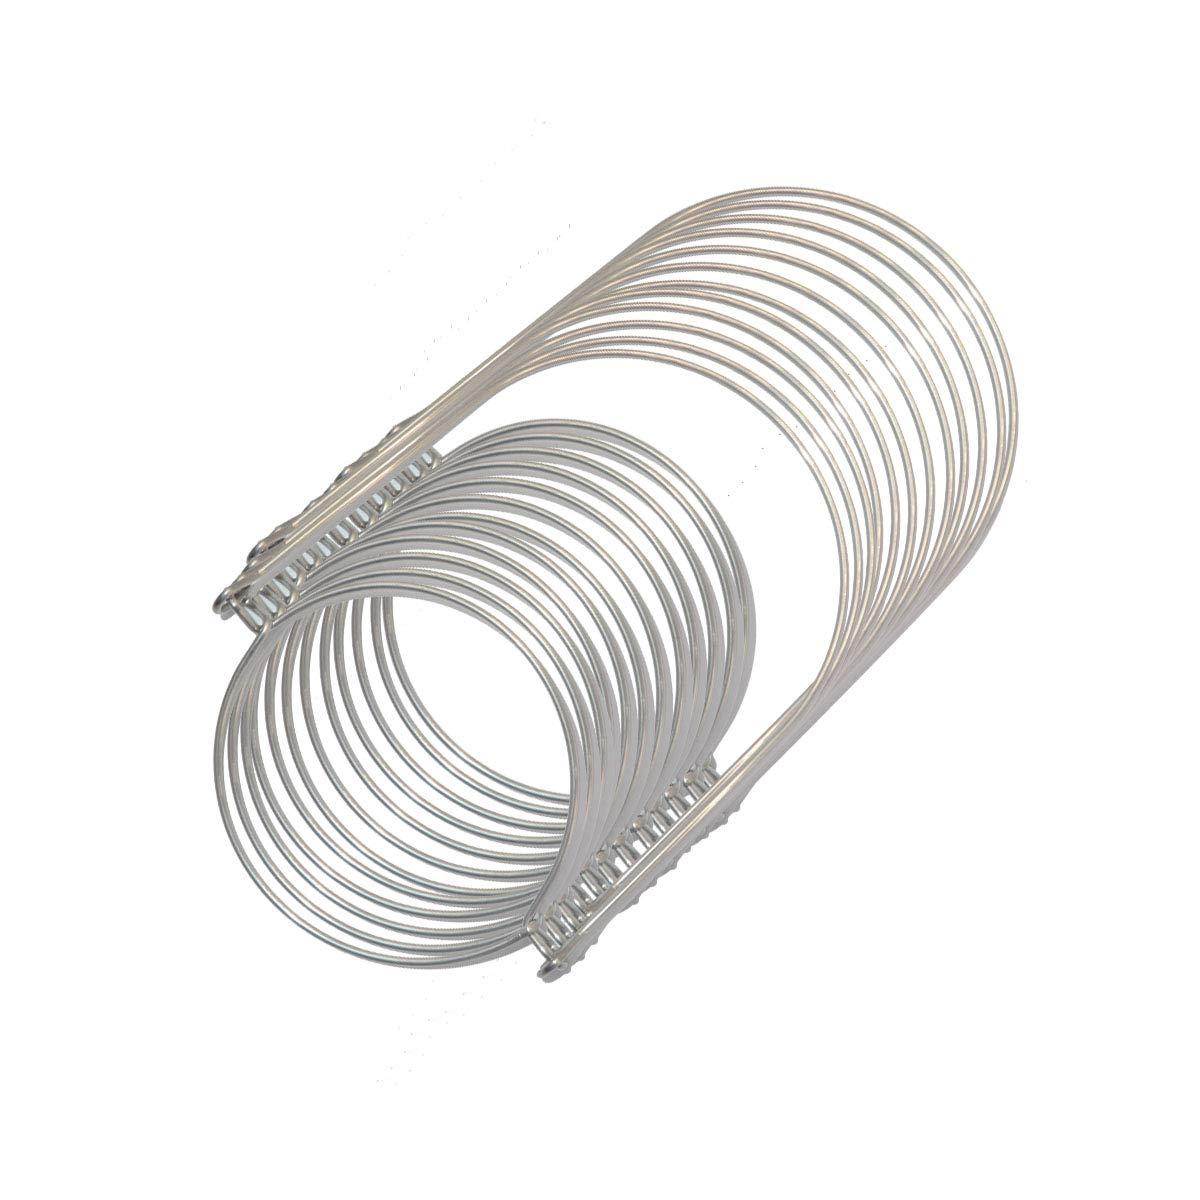 12 Pack Stainless Steel Jar Handle Silver Color for Mason Jar, Ball Pint Jar, Canning Jars,Mason Jar Hanger and Hook for Regular Mouth